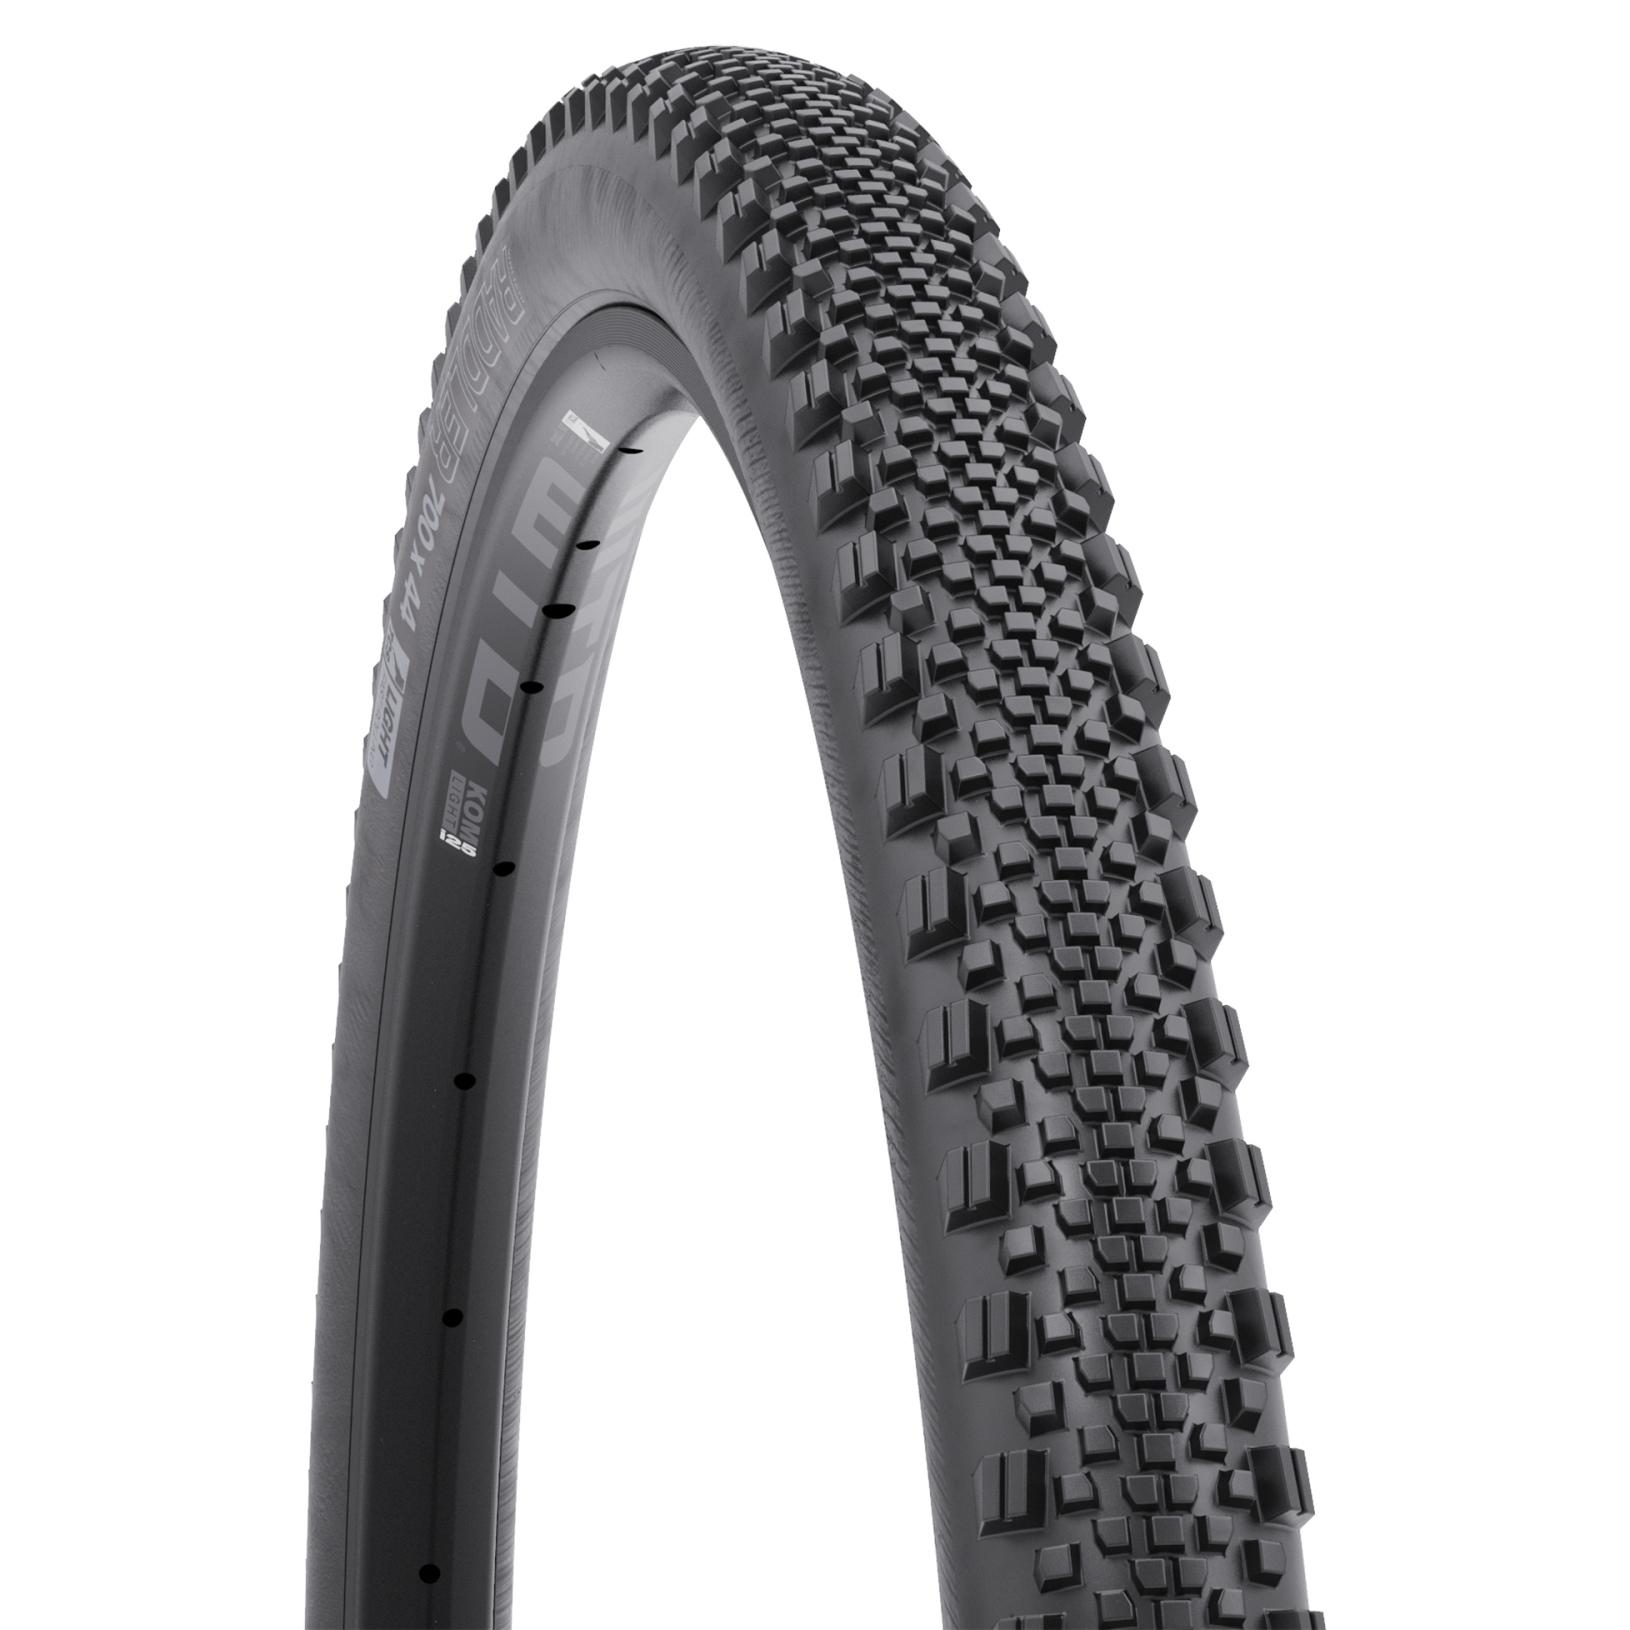 WTB Riddler 700 TCS Light/Fast Rolling Faltreifen - SG2 - 44-622 / 700 x 45C - schwarz